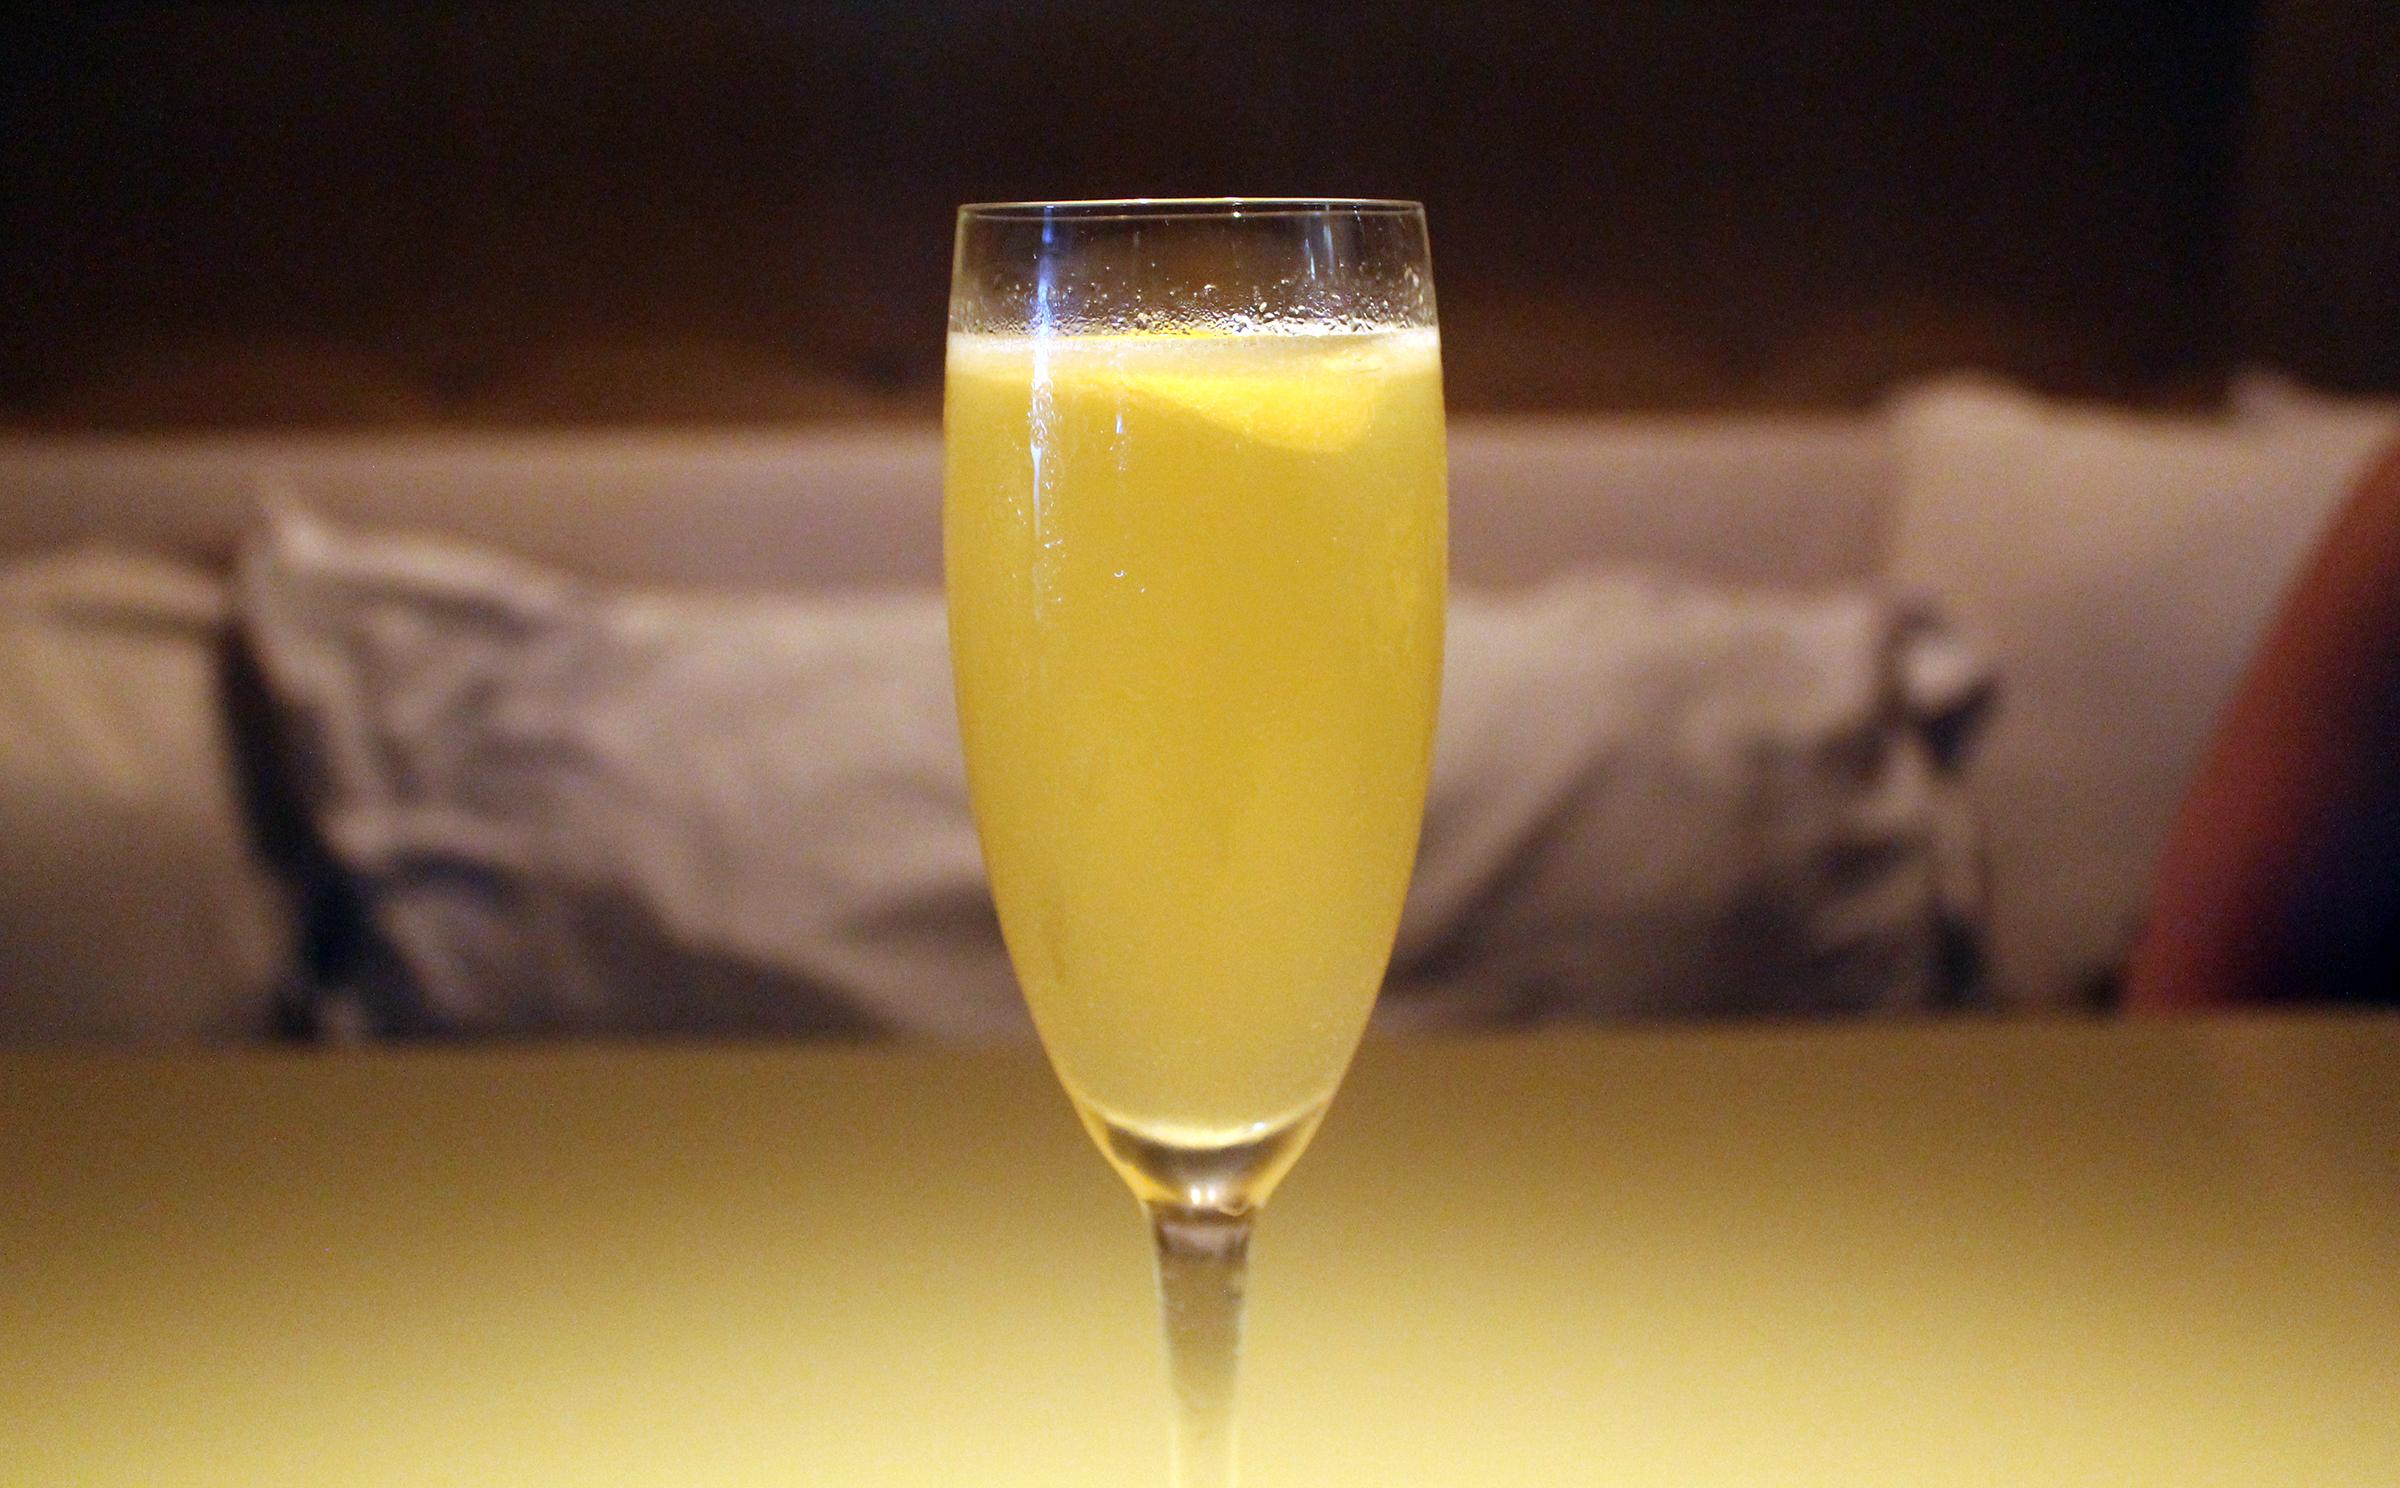 The Backspin:bombay sapphire, prickly pear, honey syrup, lemon juice